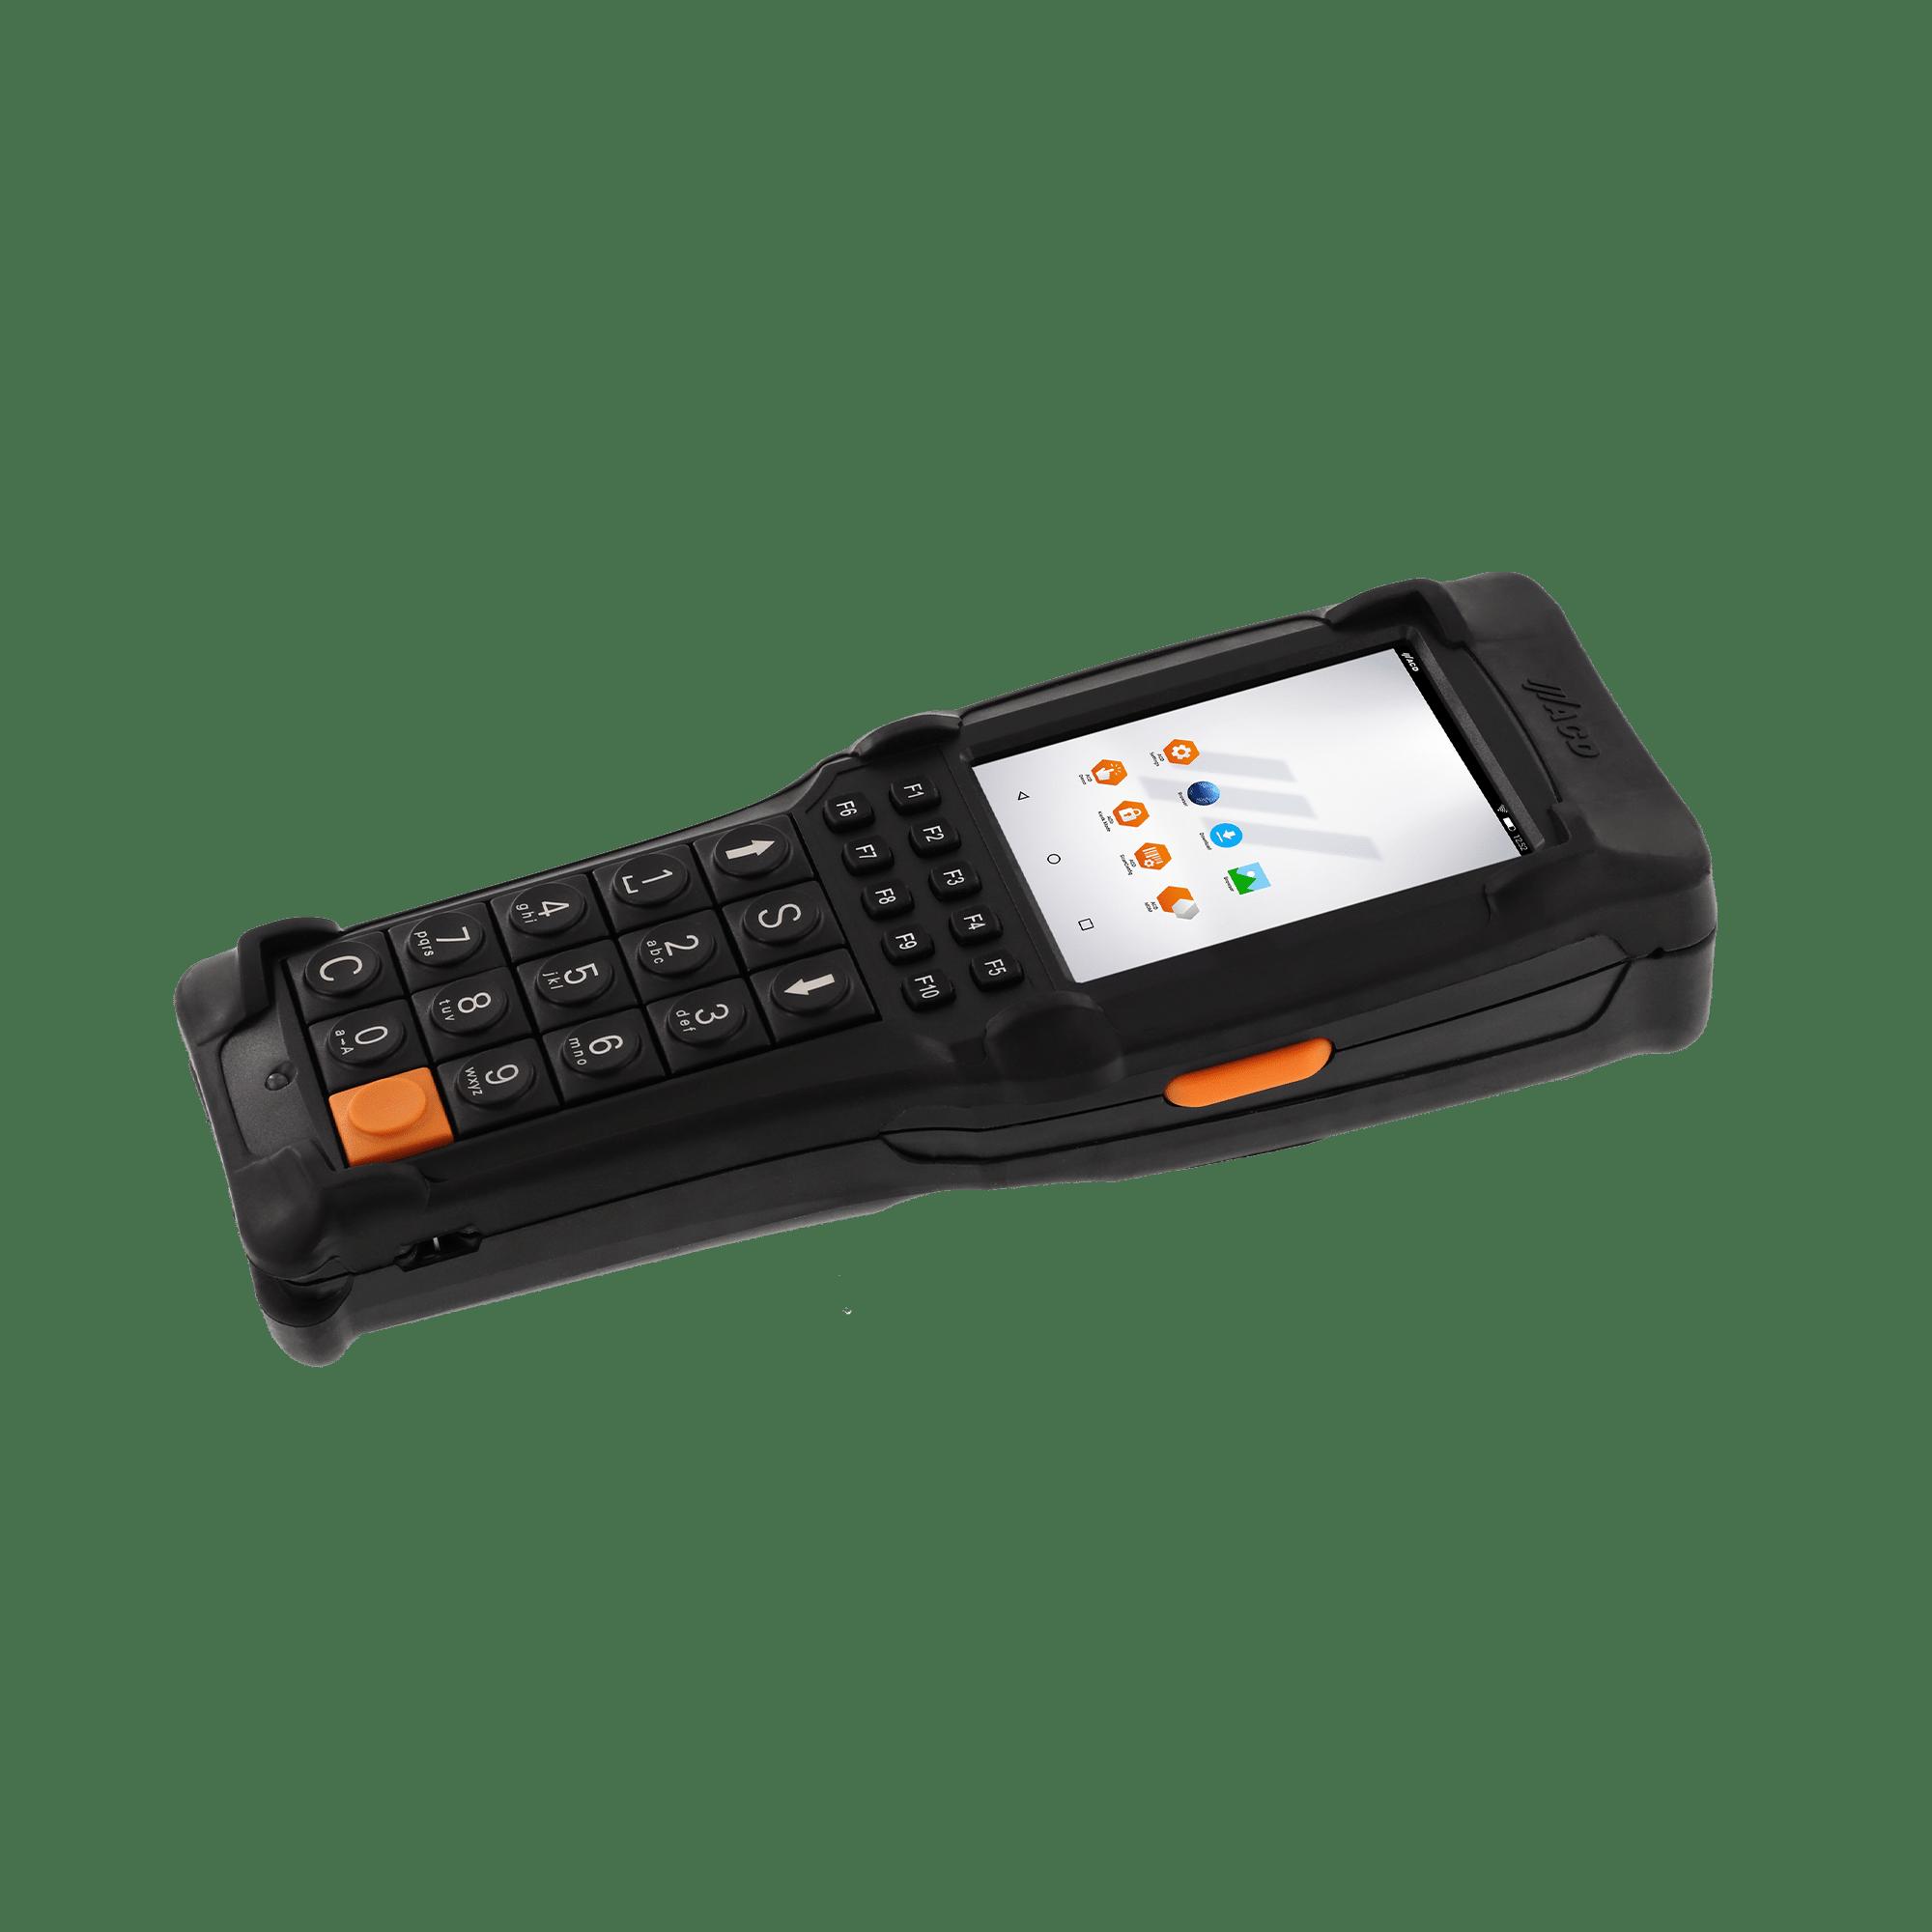 M270 Mobile Handheld Computer